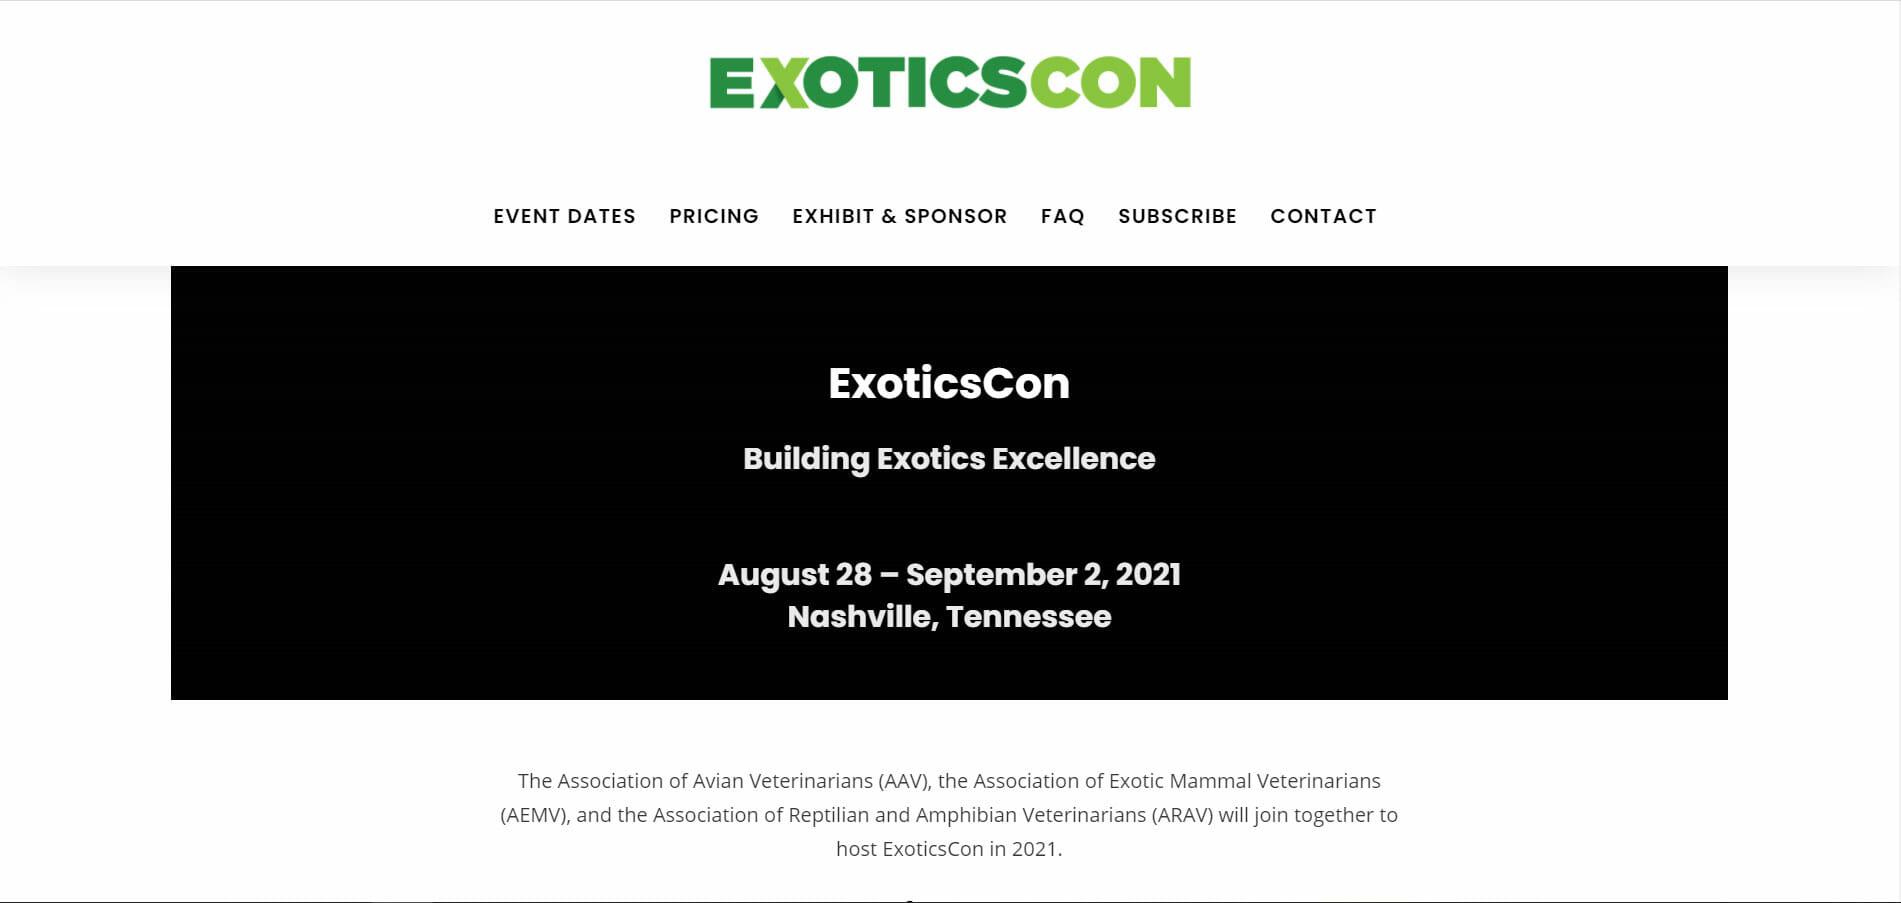 exoticscon